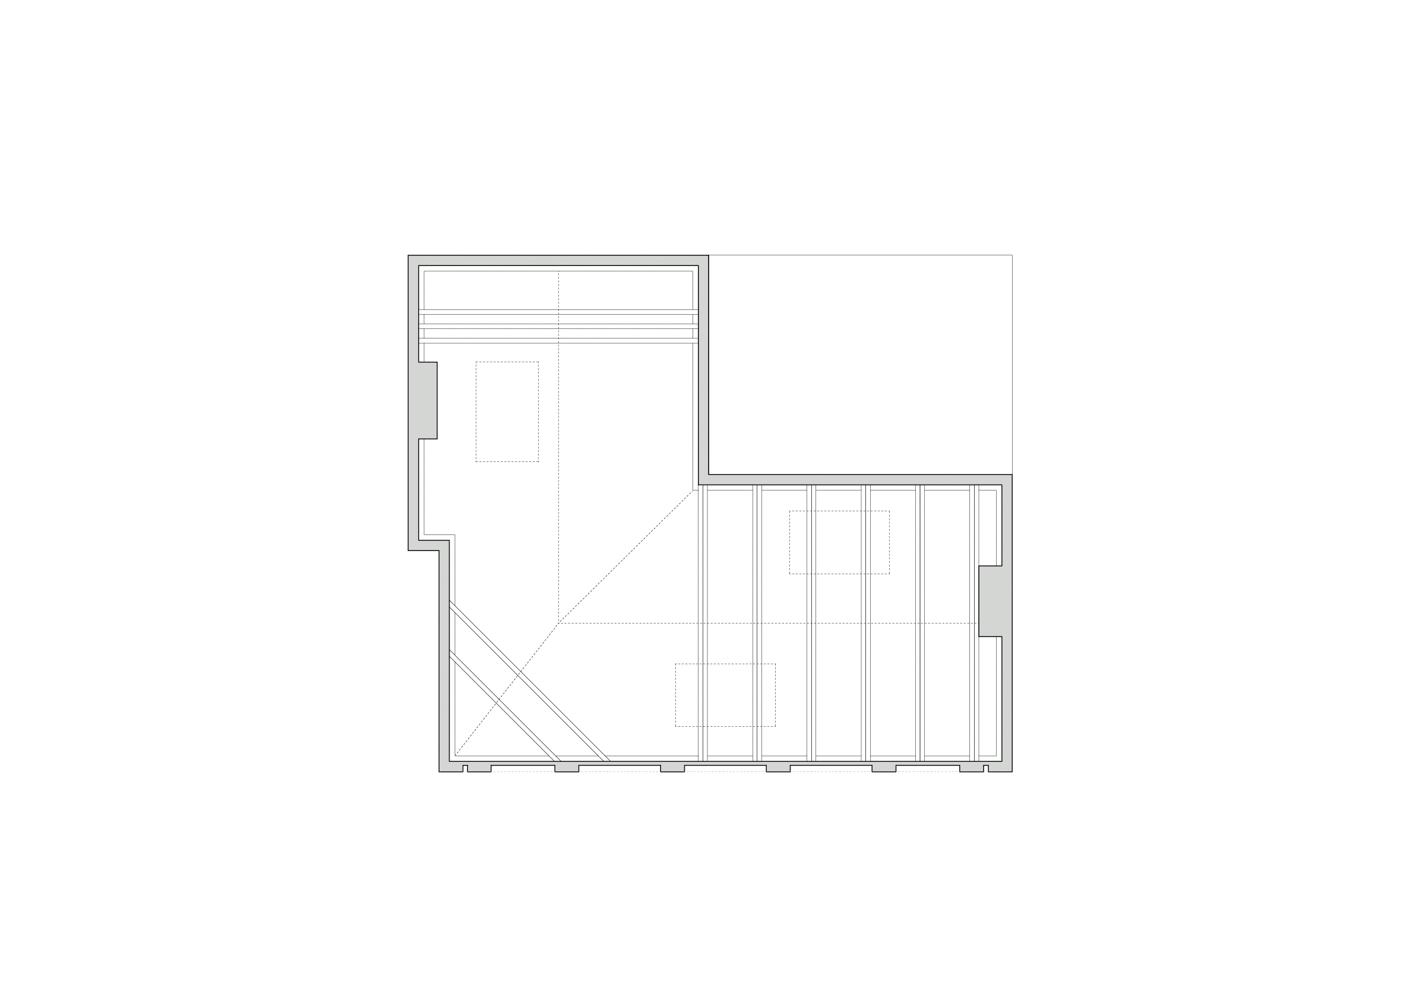 defoe-road-paper-house-project-the-design-emotive-21.jpg